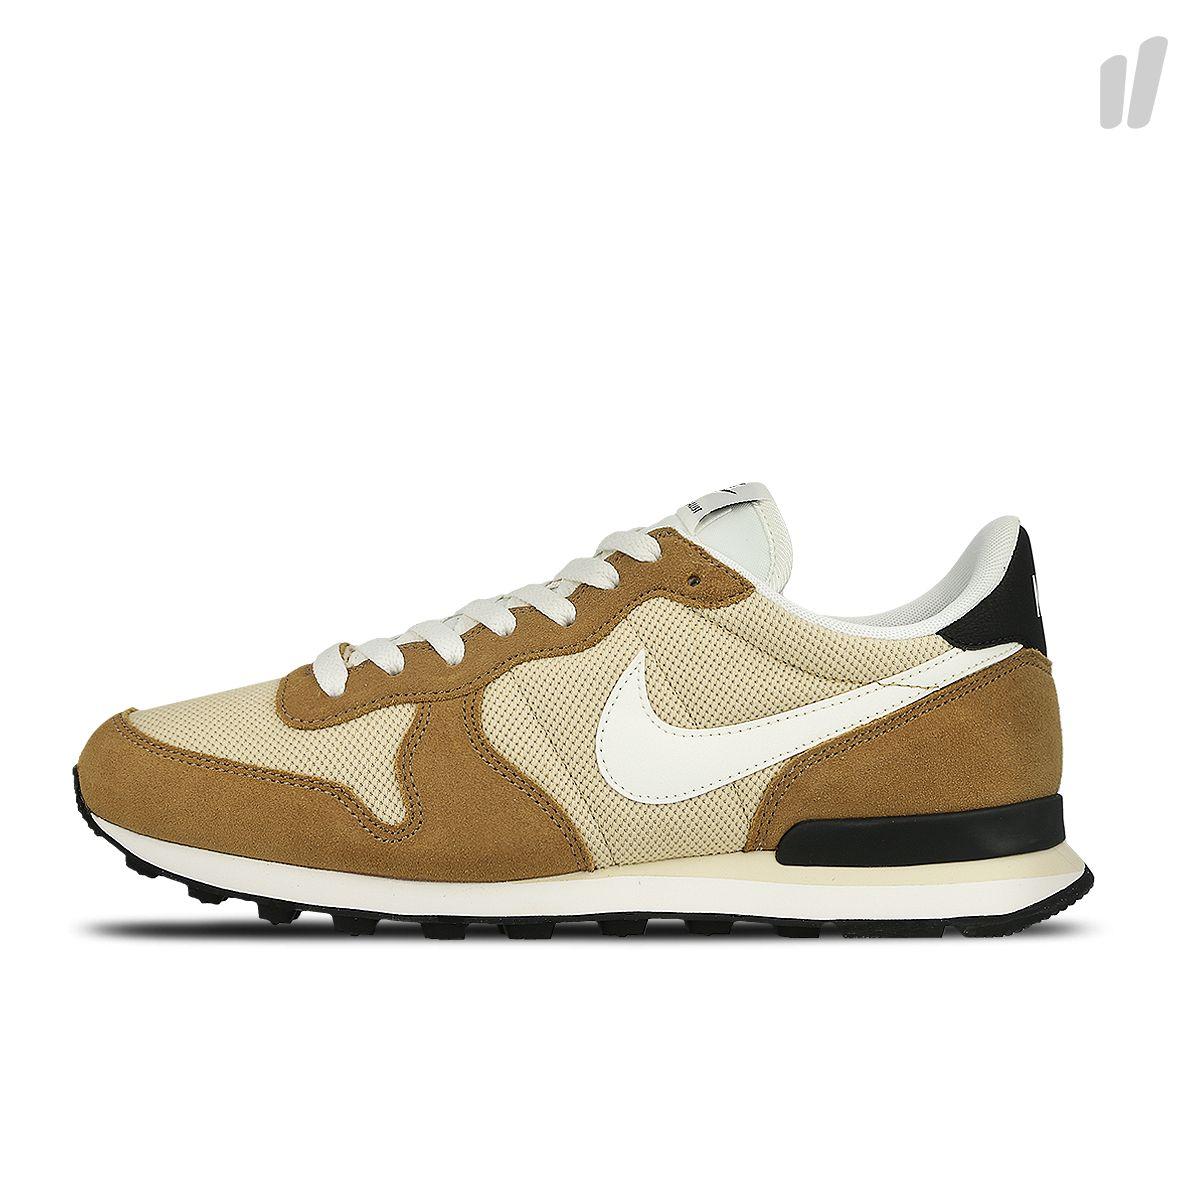 Nike Internationalist ( 828041 701 ) #lpu #sneaker #dailydrops #hypesrus